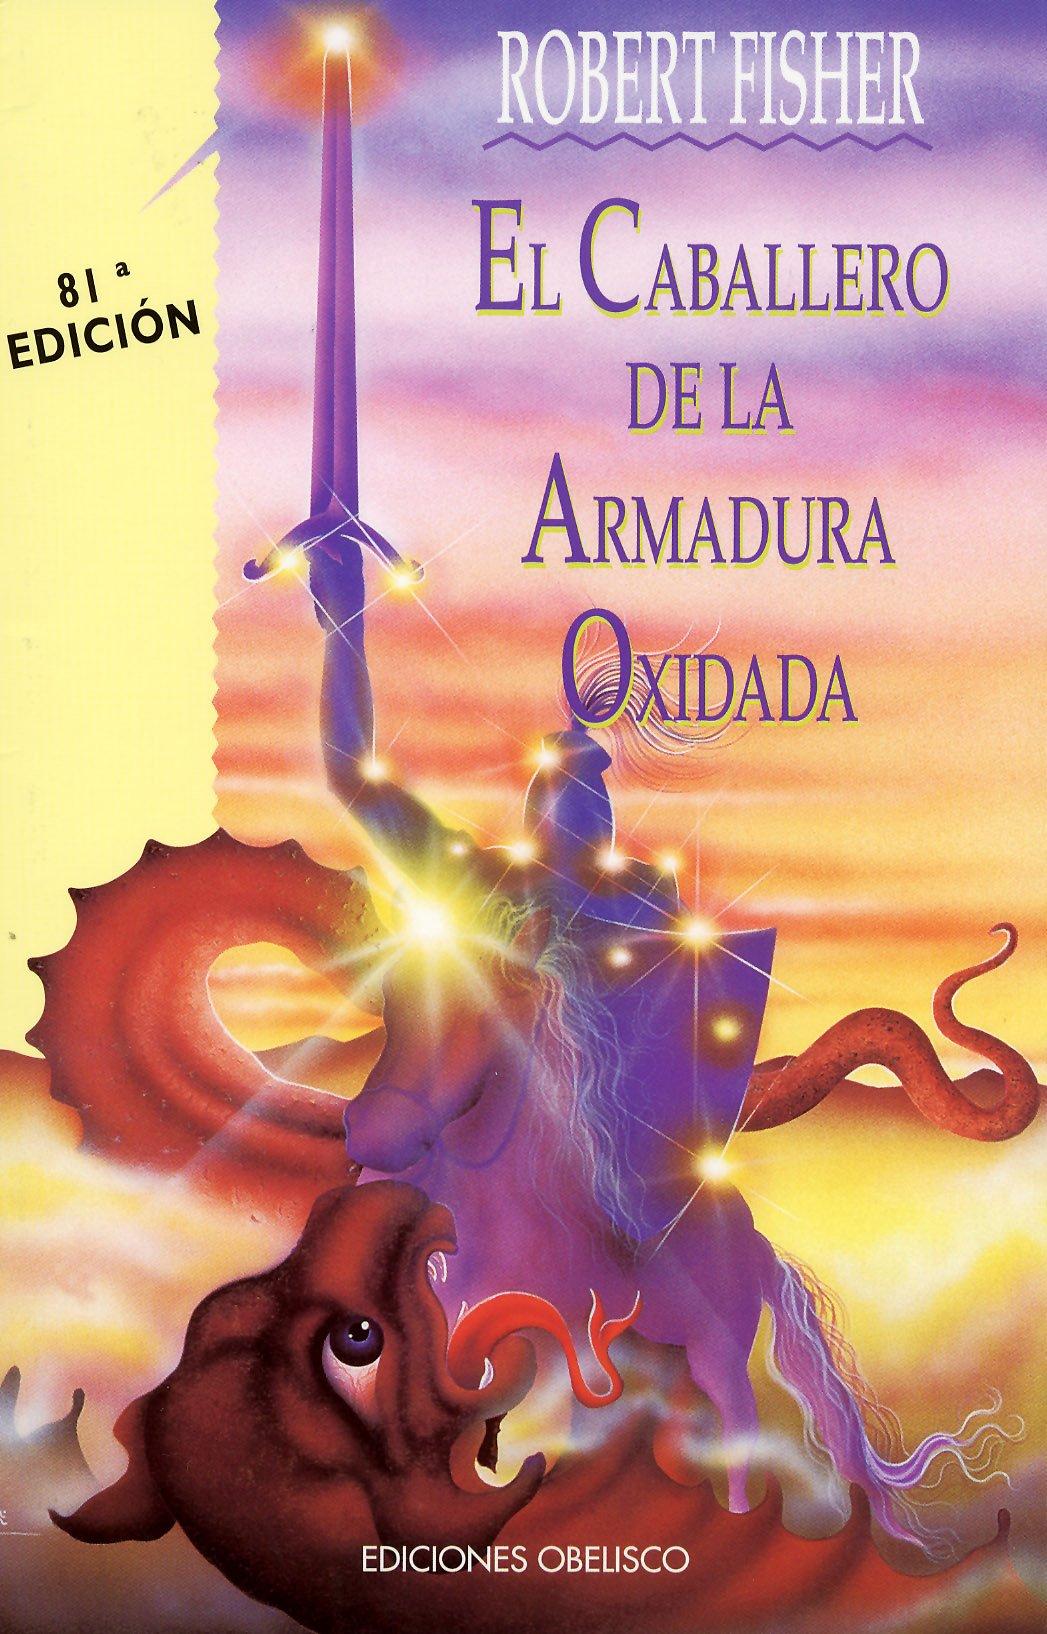 El Caballero De La Armadura Oxidada Fisher Robert 9788477204053 Books Amazon Ca